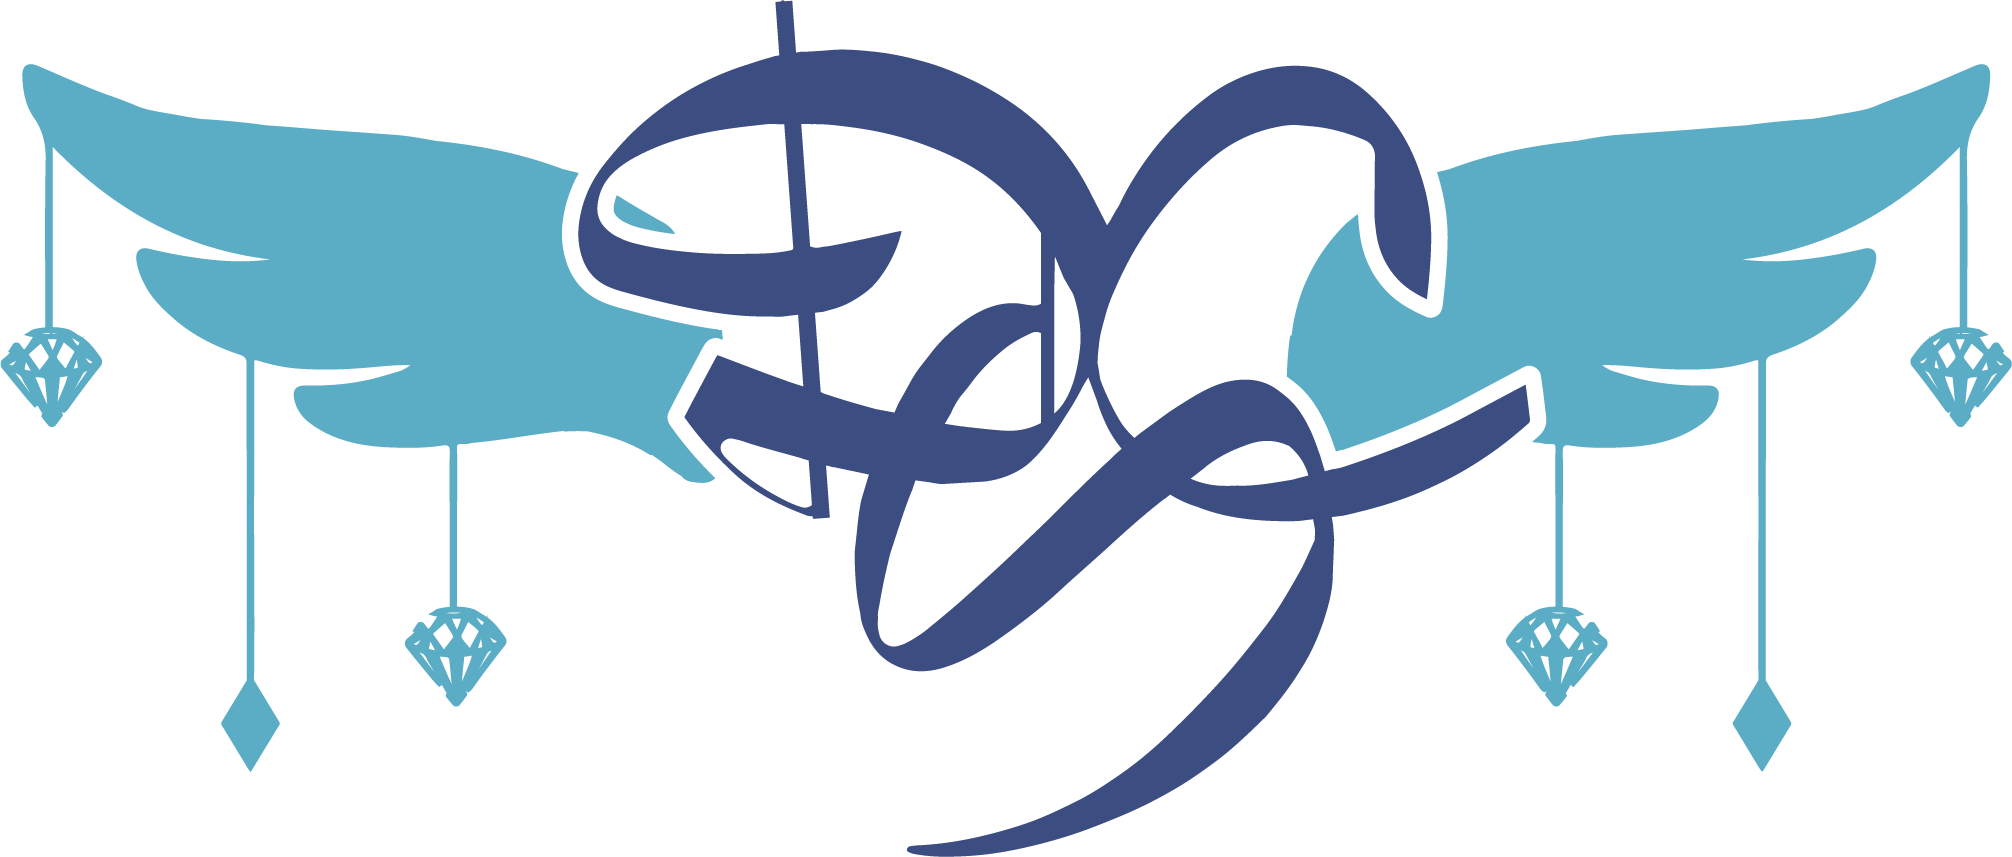 Teamwork clipart doodle. Craft studios deviantart theres